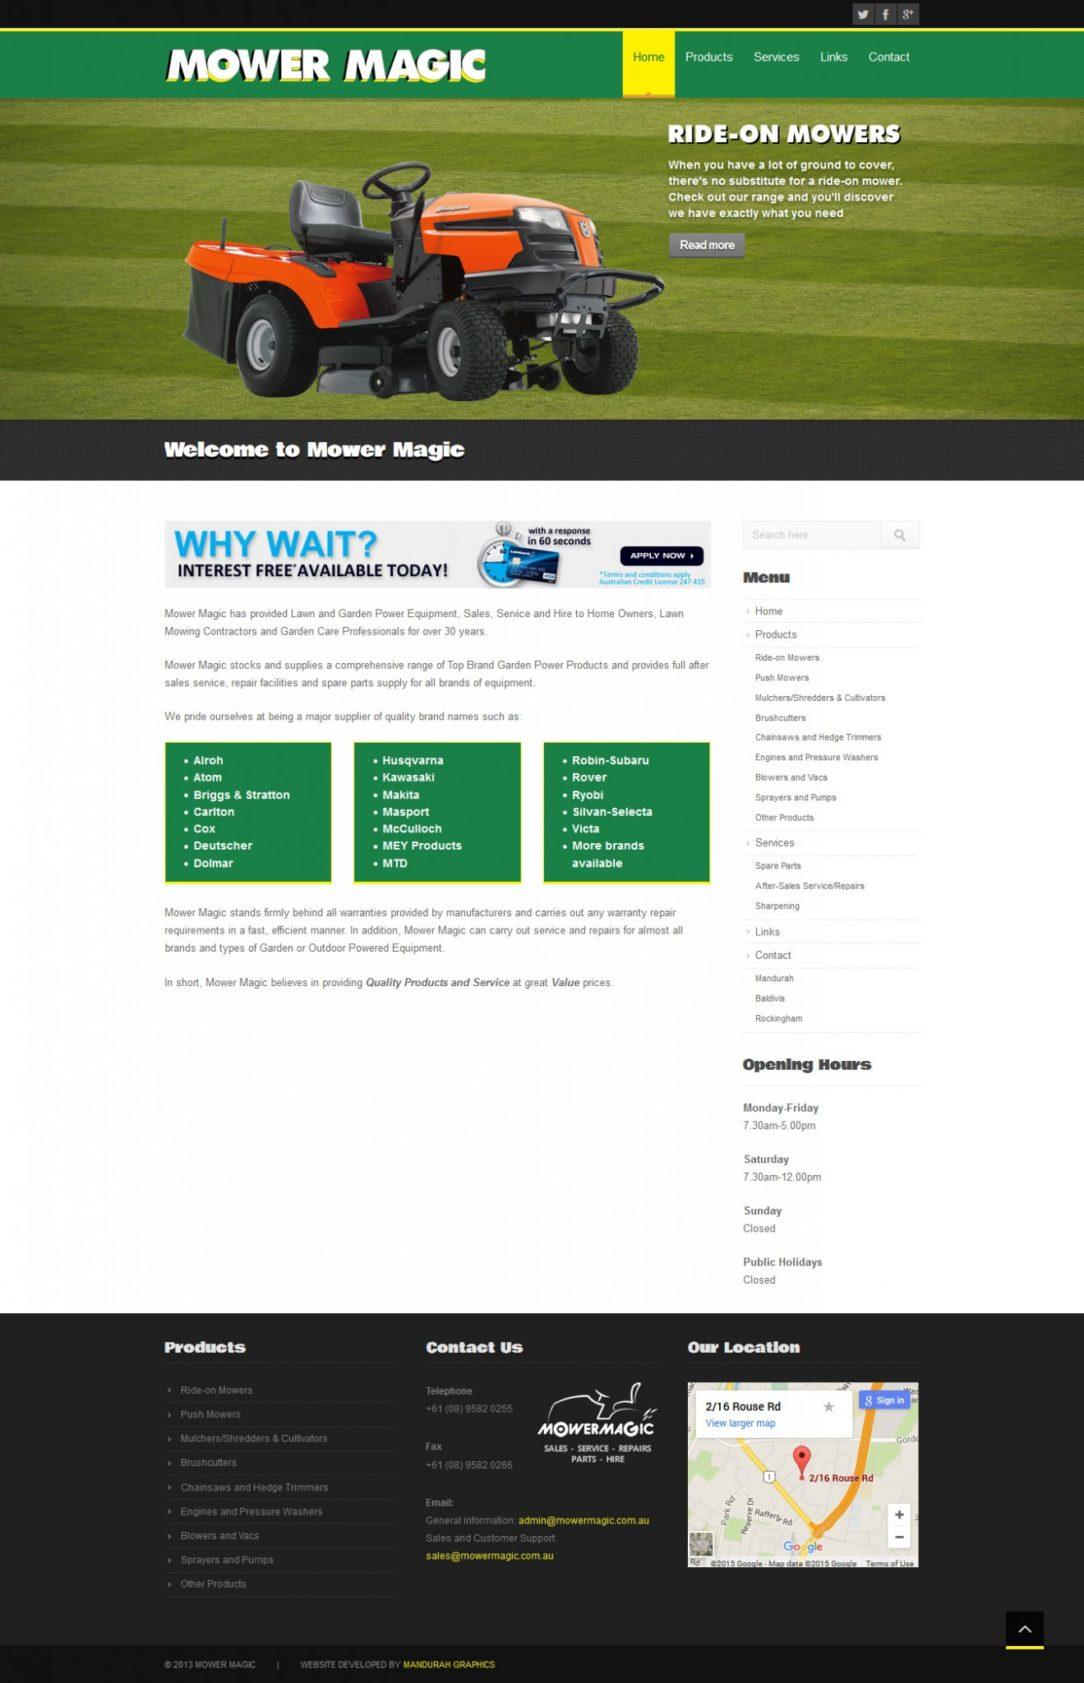 Mower Magic Website Design and Development